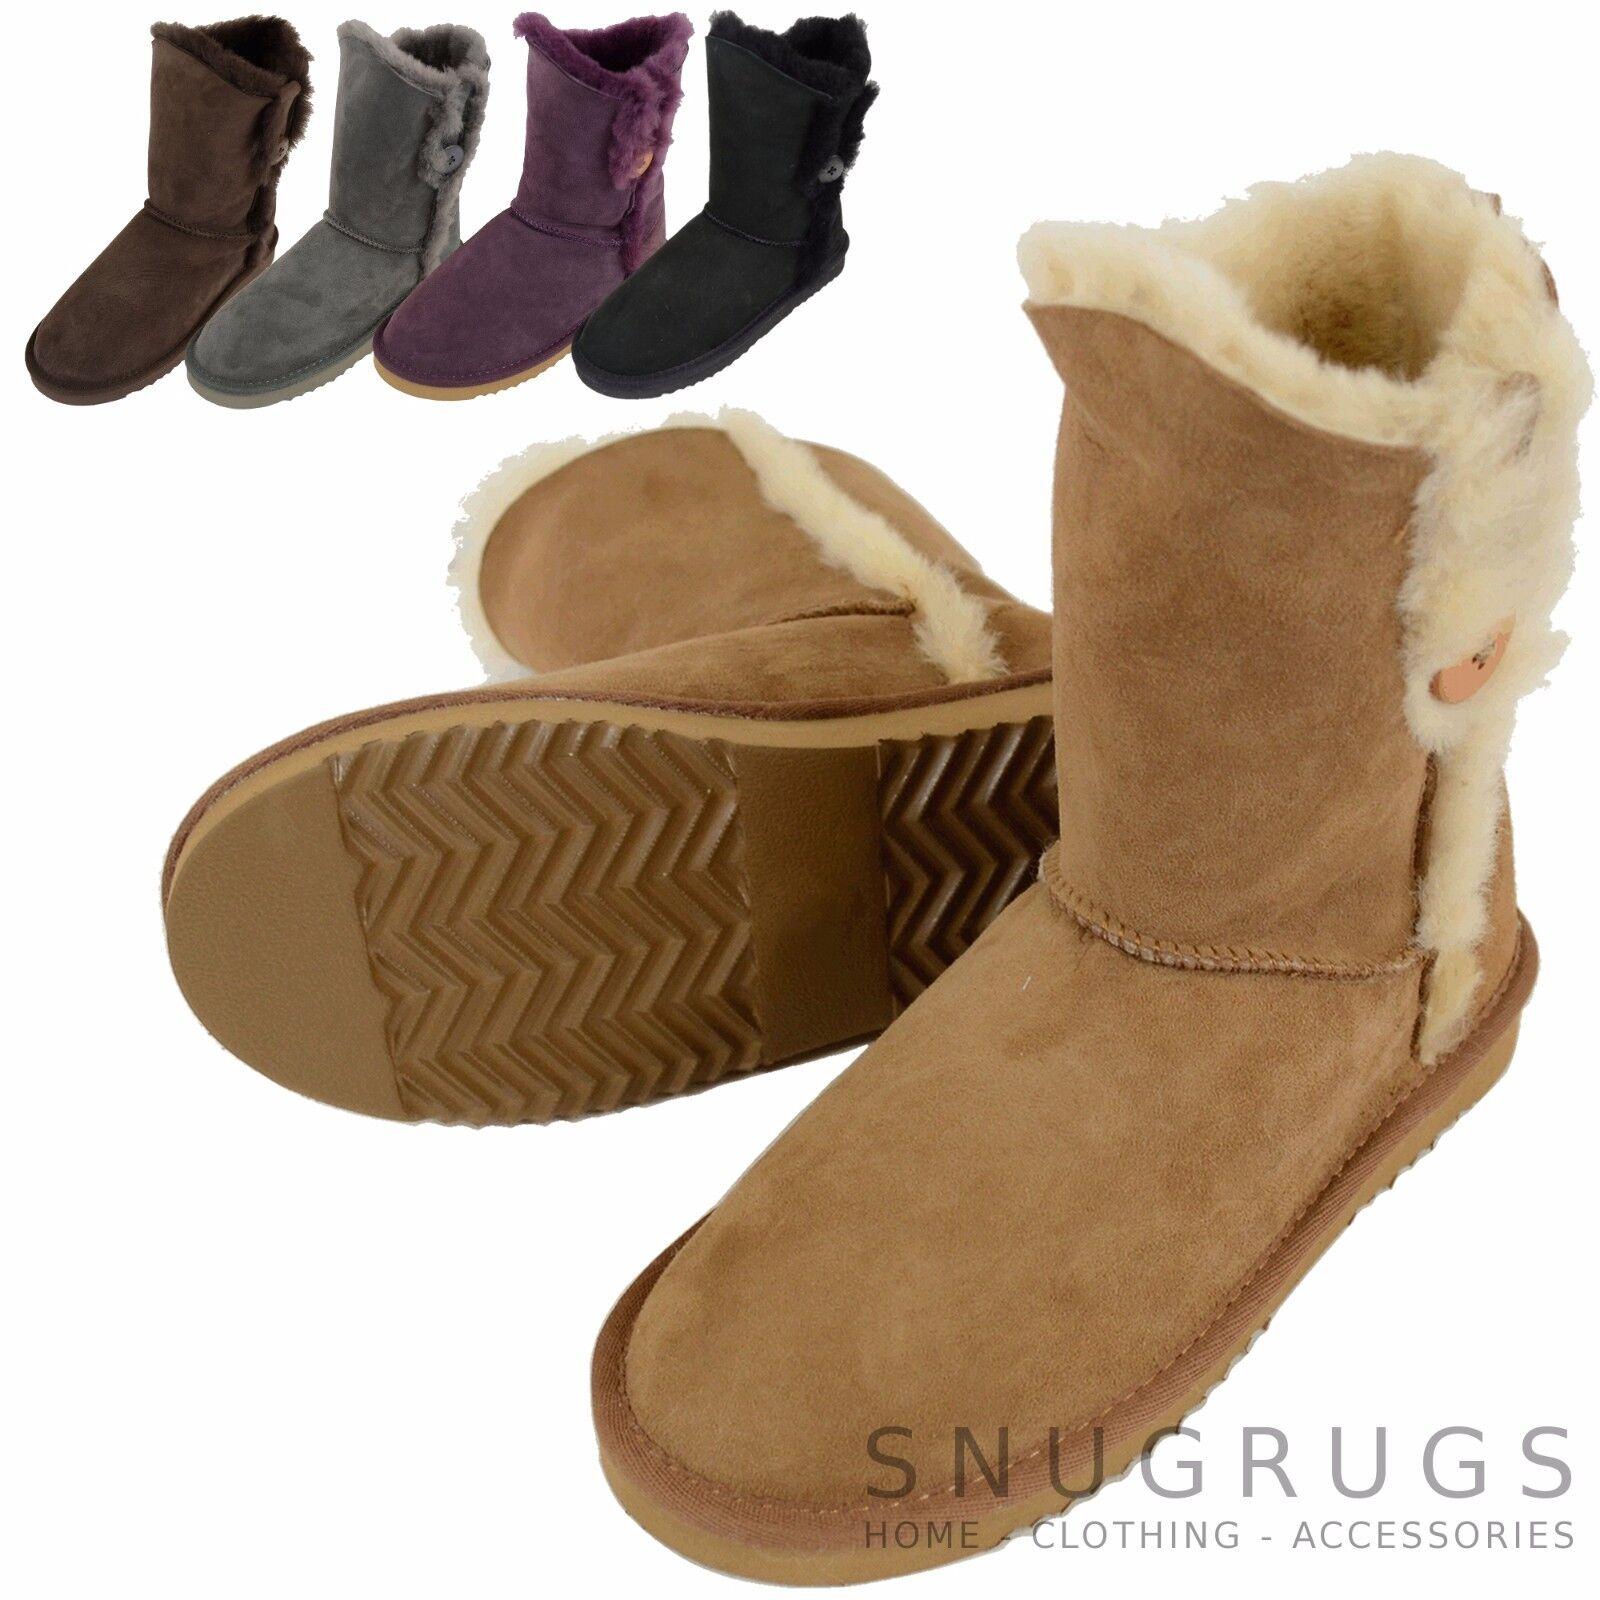 Ladies / Womens Full Sheepskin Calf Length Short Boot with Button Design